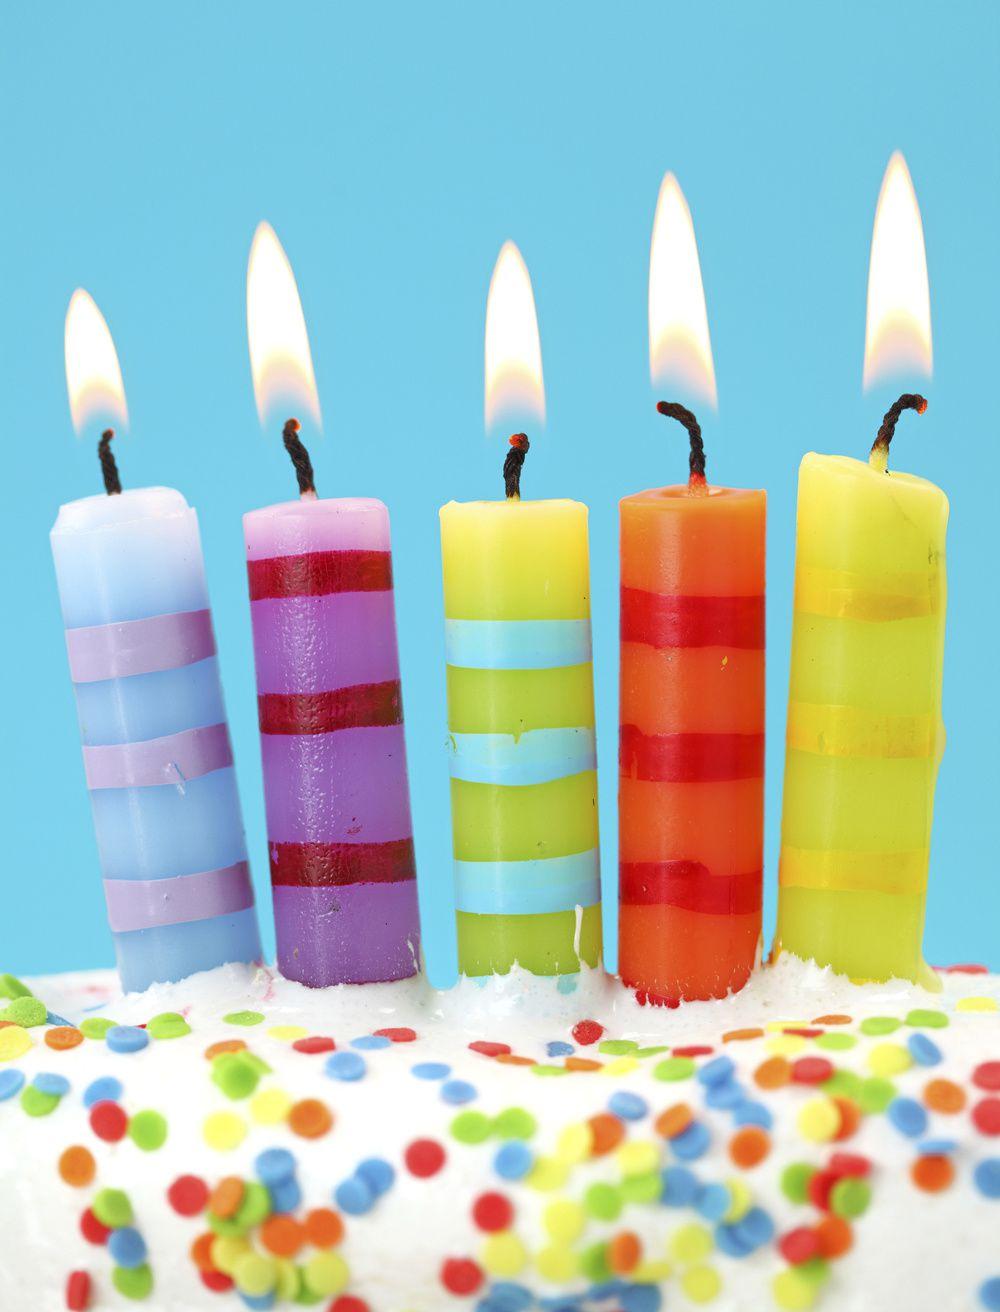 !!! Le blog a 5 ans !!!